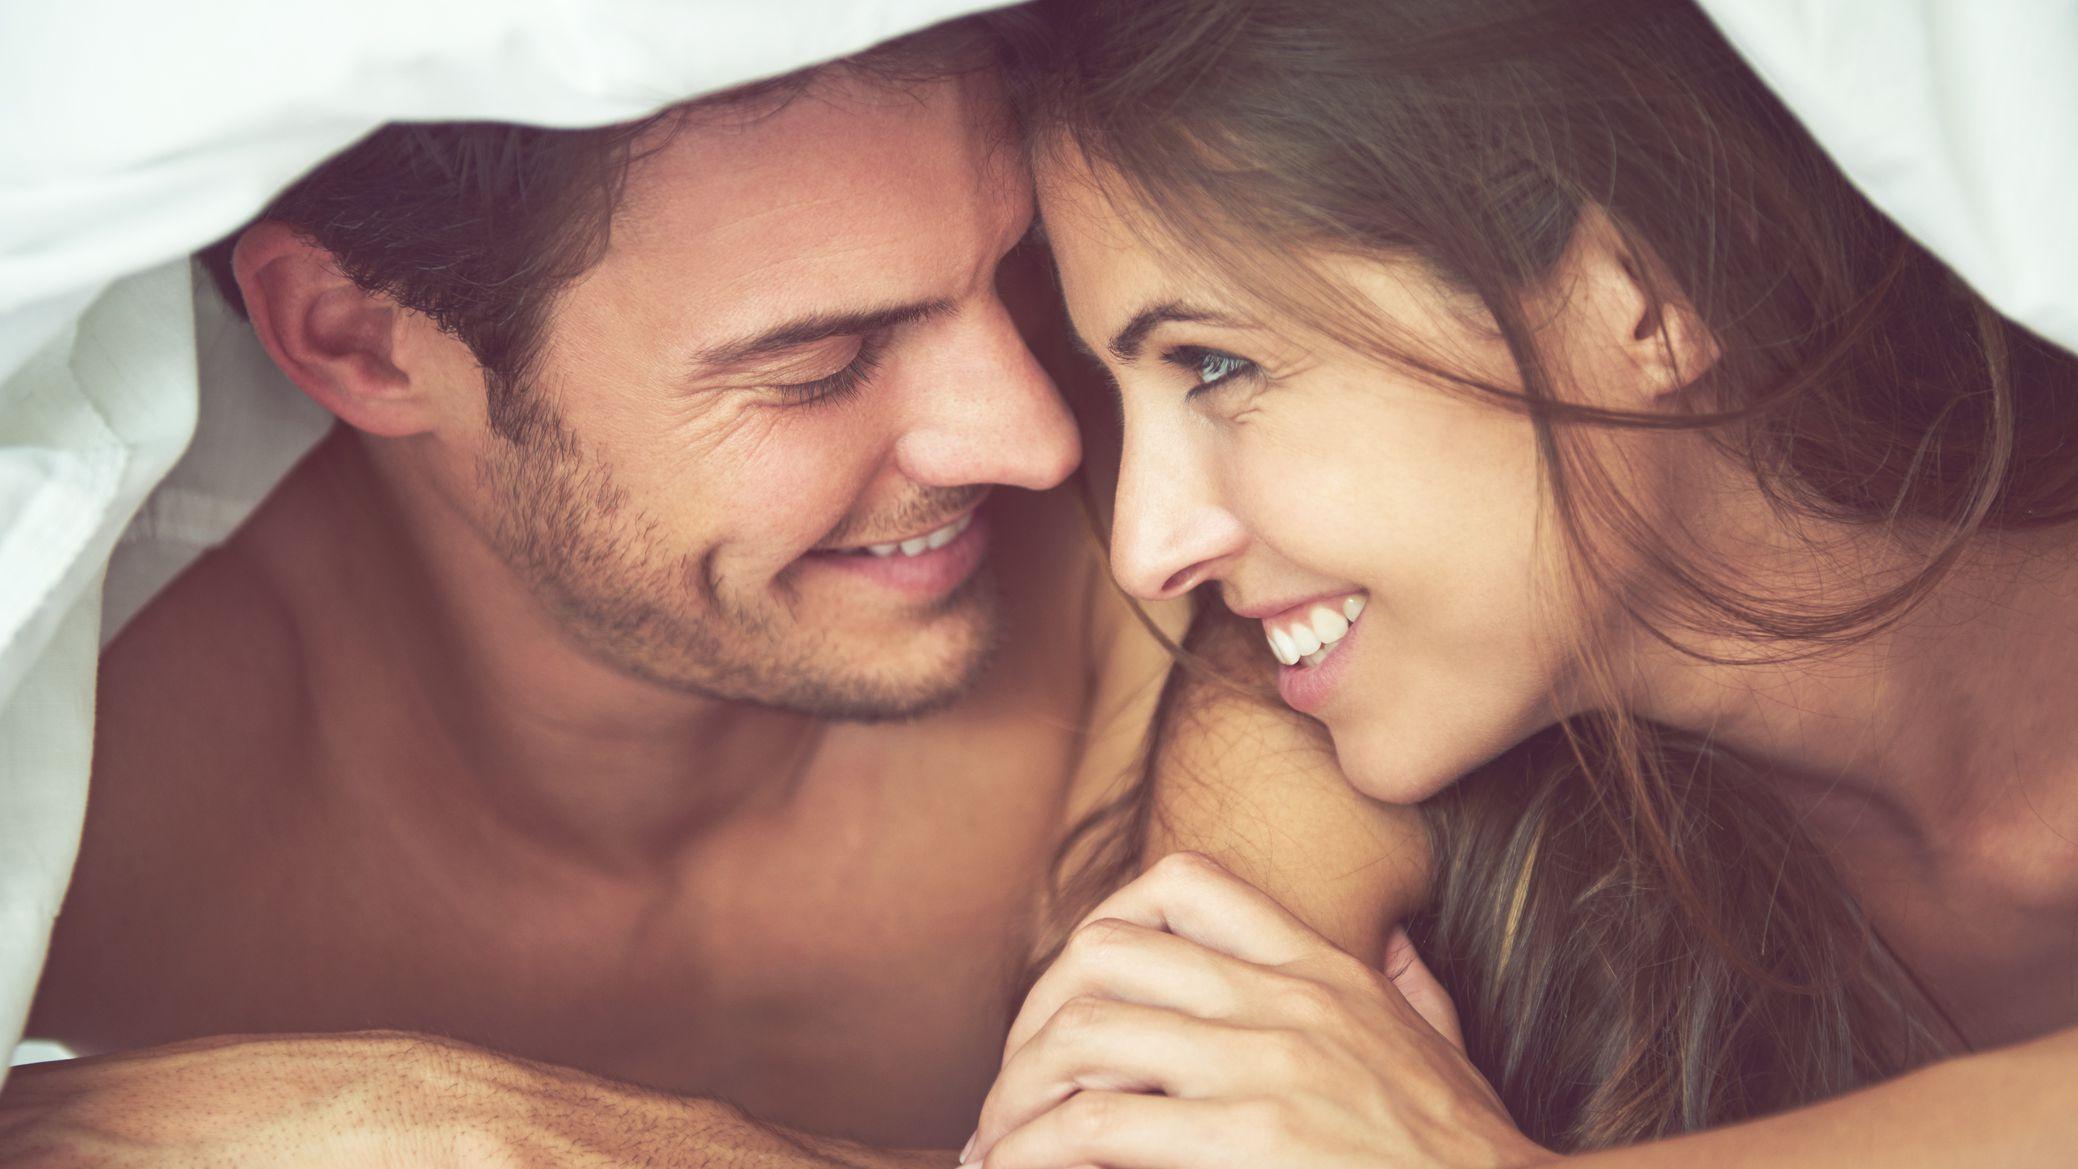 bed-couple-487691402-584c46703df78c491e9730ac